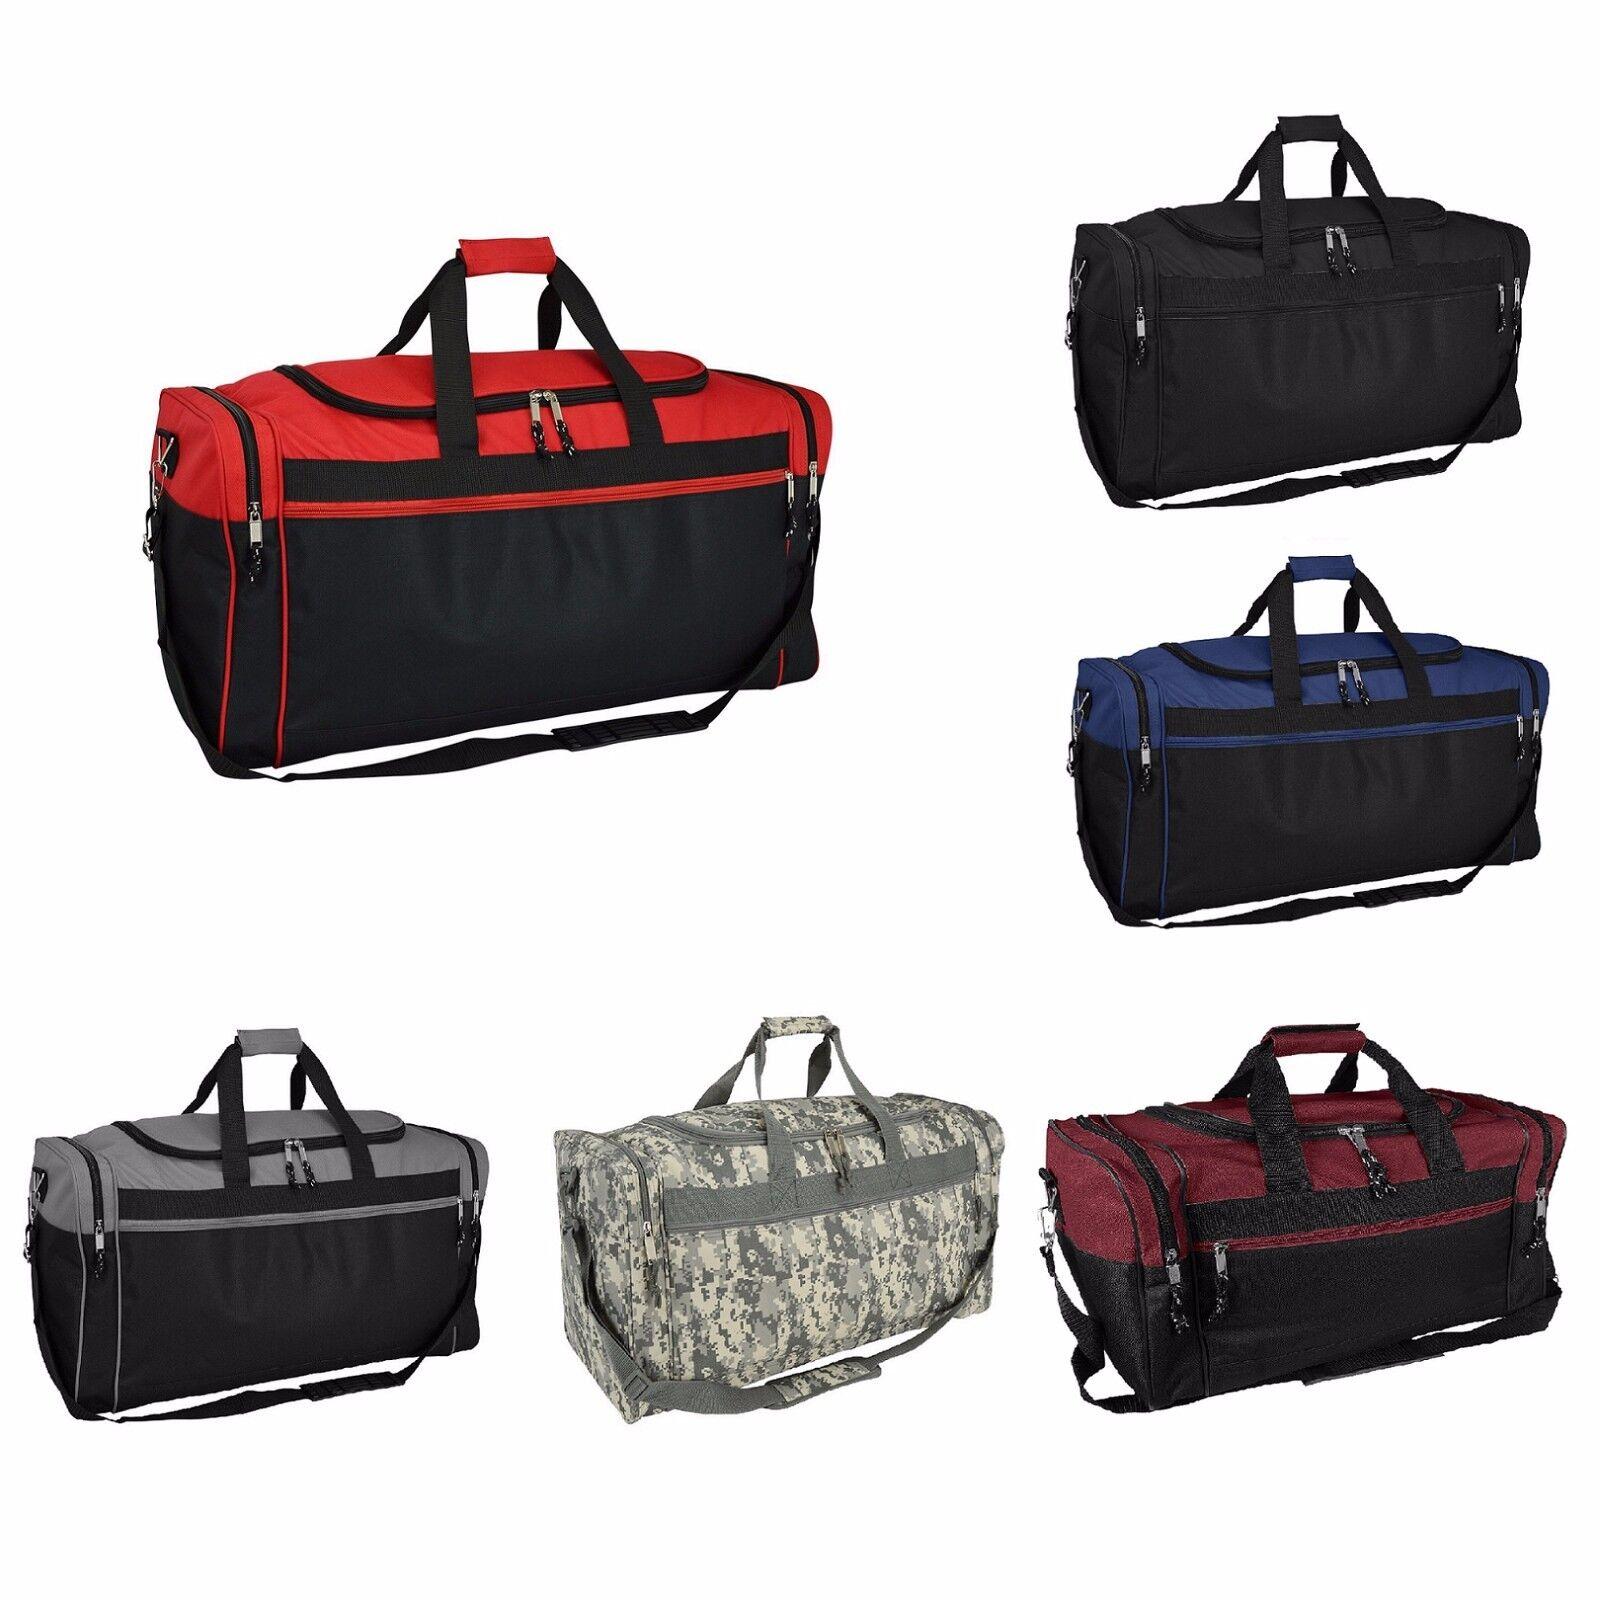 DALIX 25″ Extra Large Travel Vacation Overnight Duffle Bag in Black Luggage